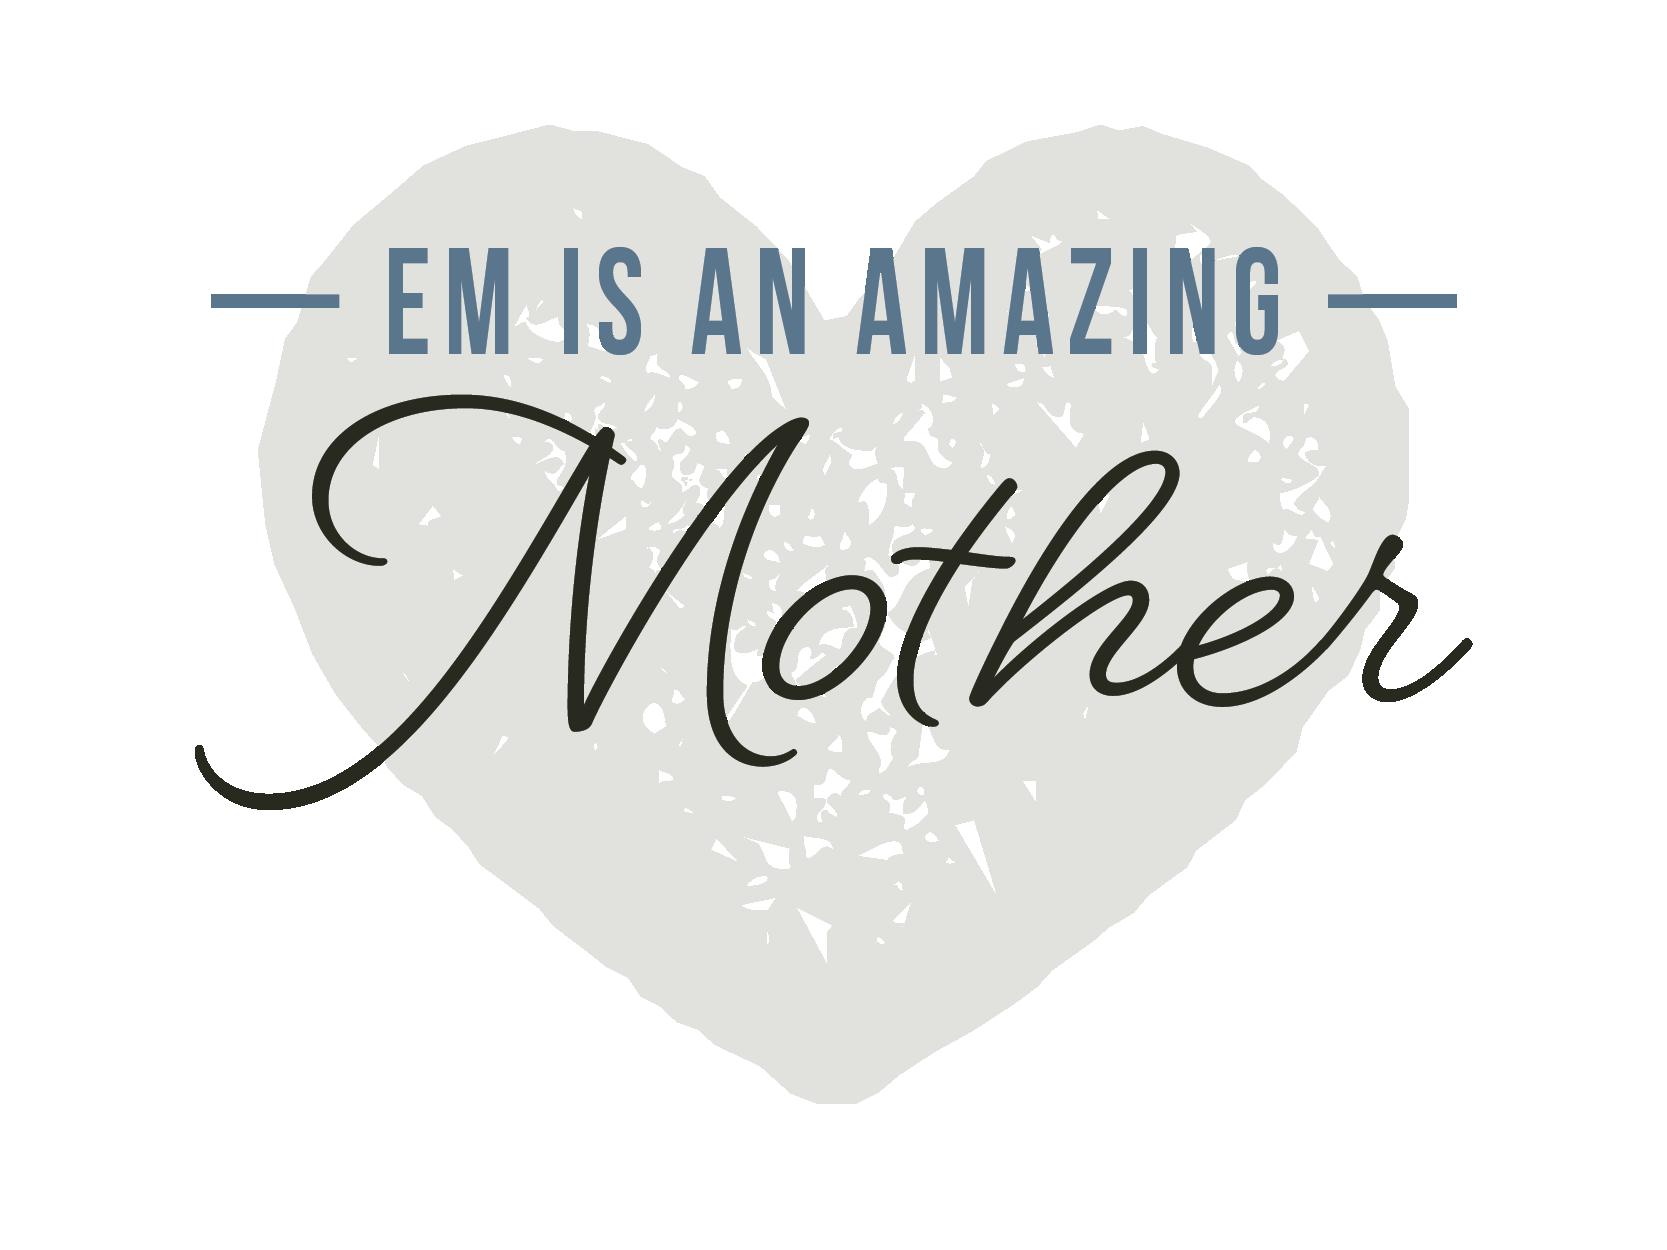 Hopeful adoptive mom Emmie